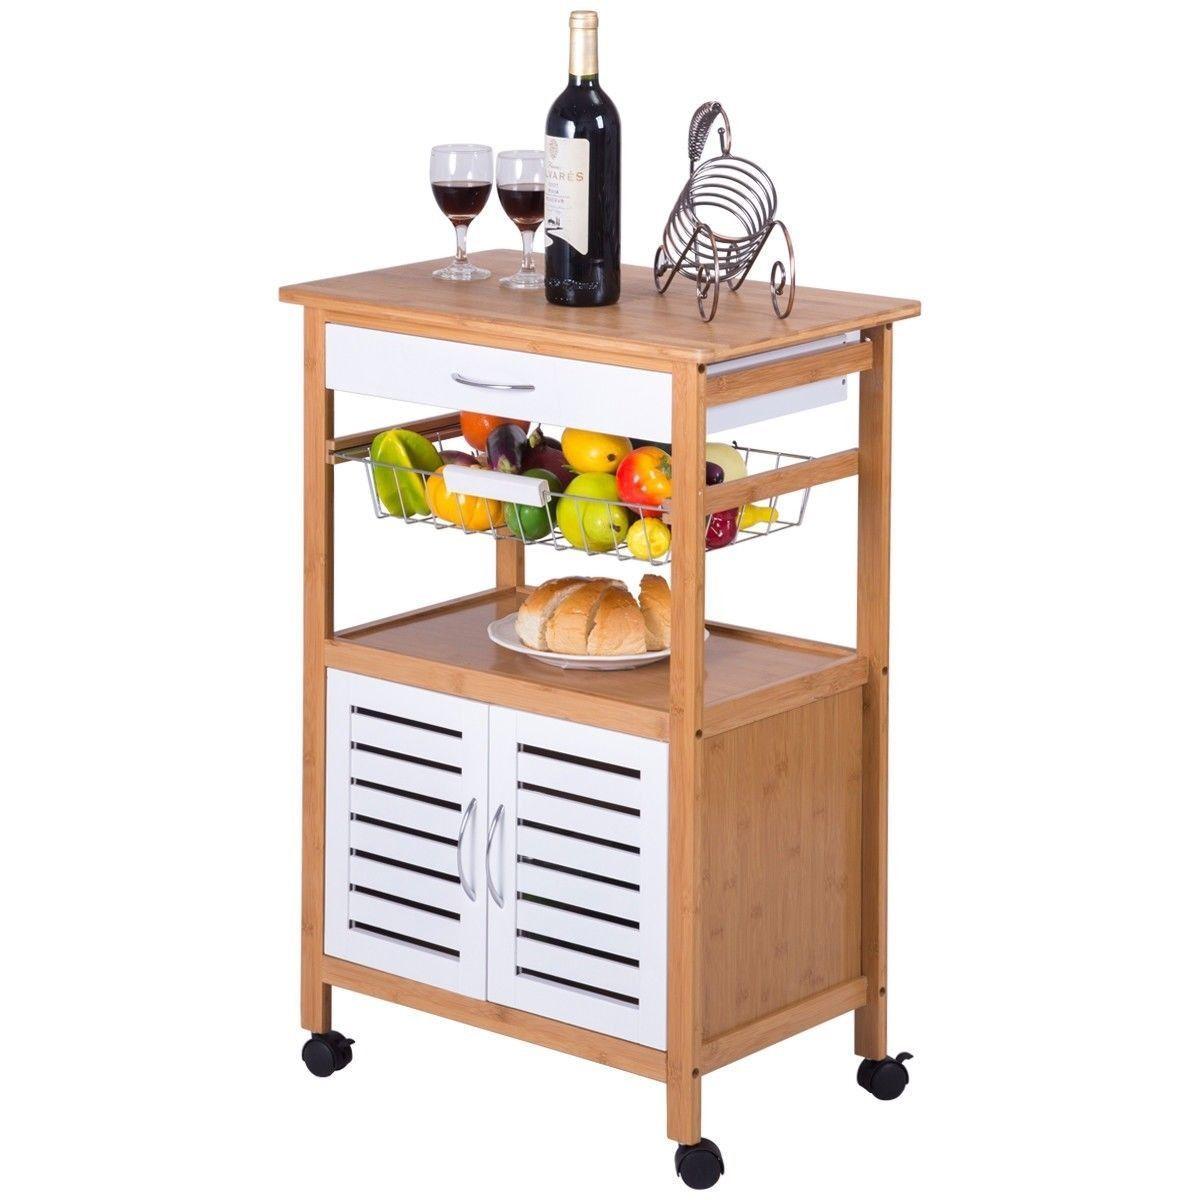 kitchen cart with drawers metal shelf מוצר home bamboo rolling storage trolley drawer basket us